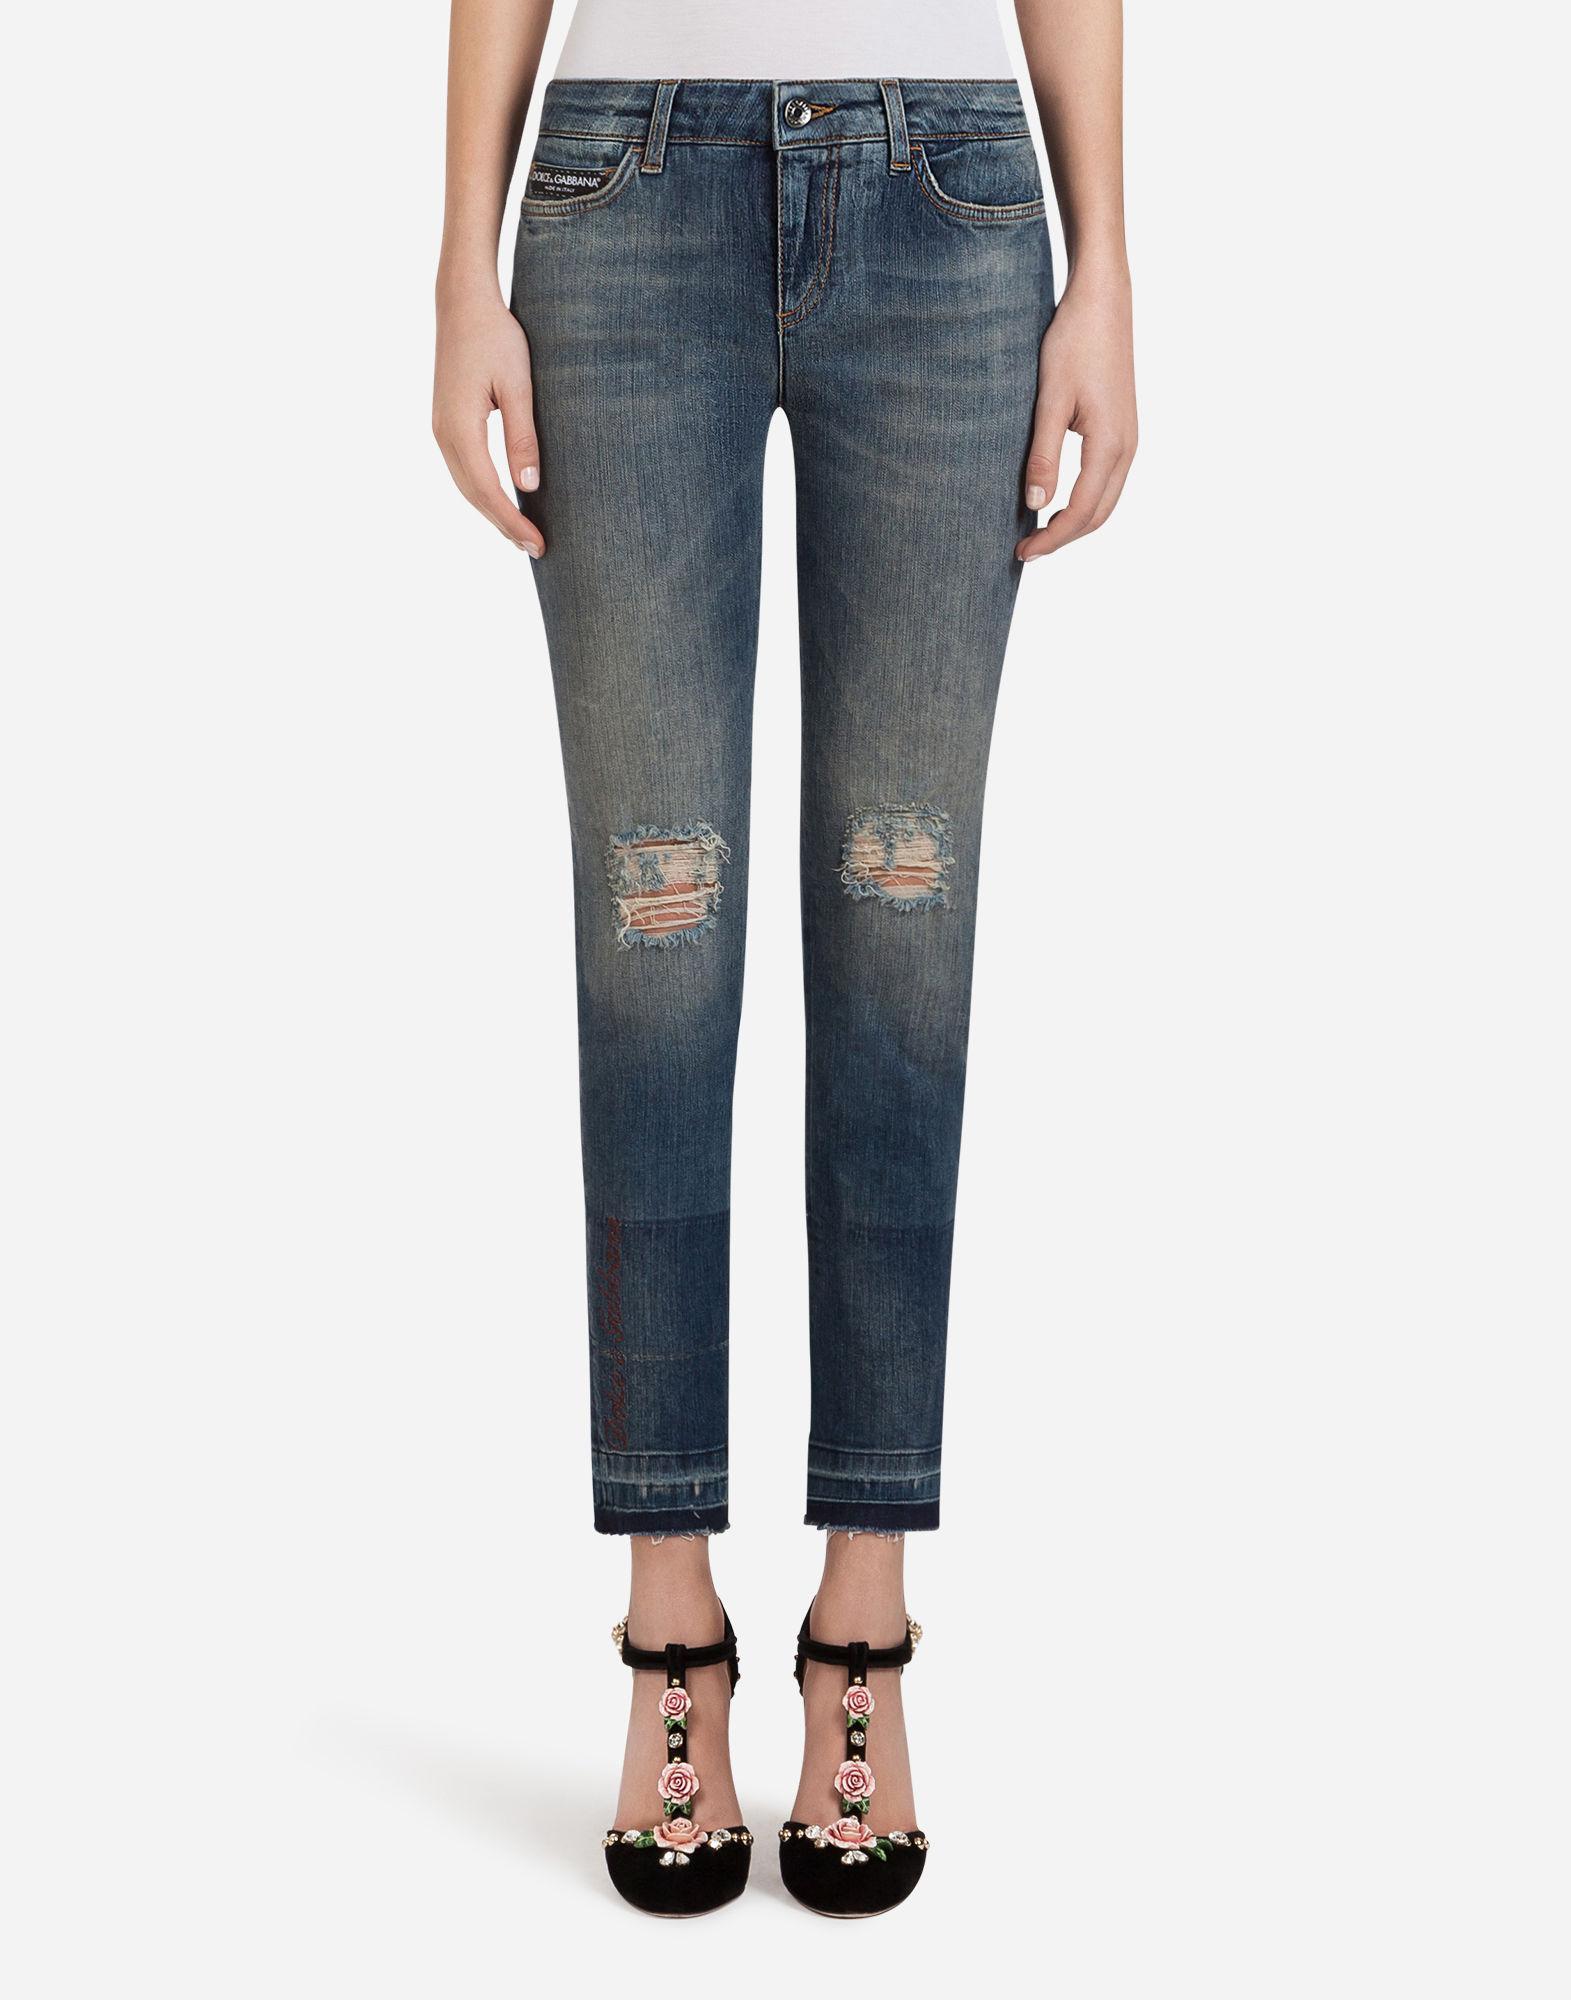 Dolce & Gabbana Denim Stretch Fit Pretty Jeans With Patch Label In Blue